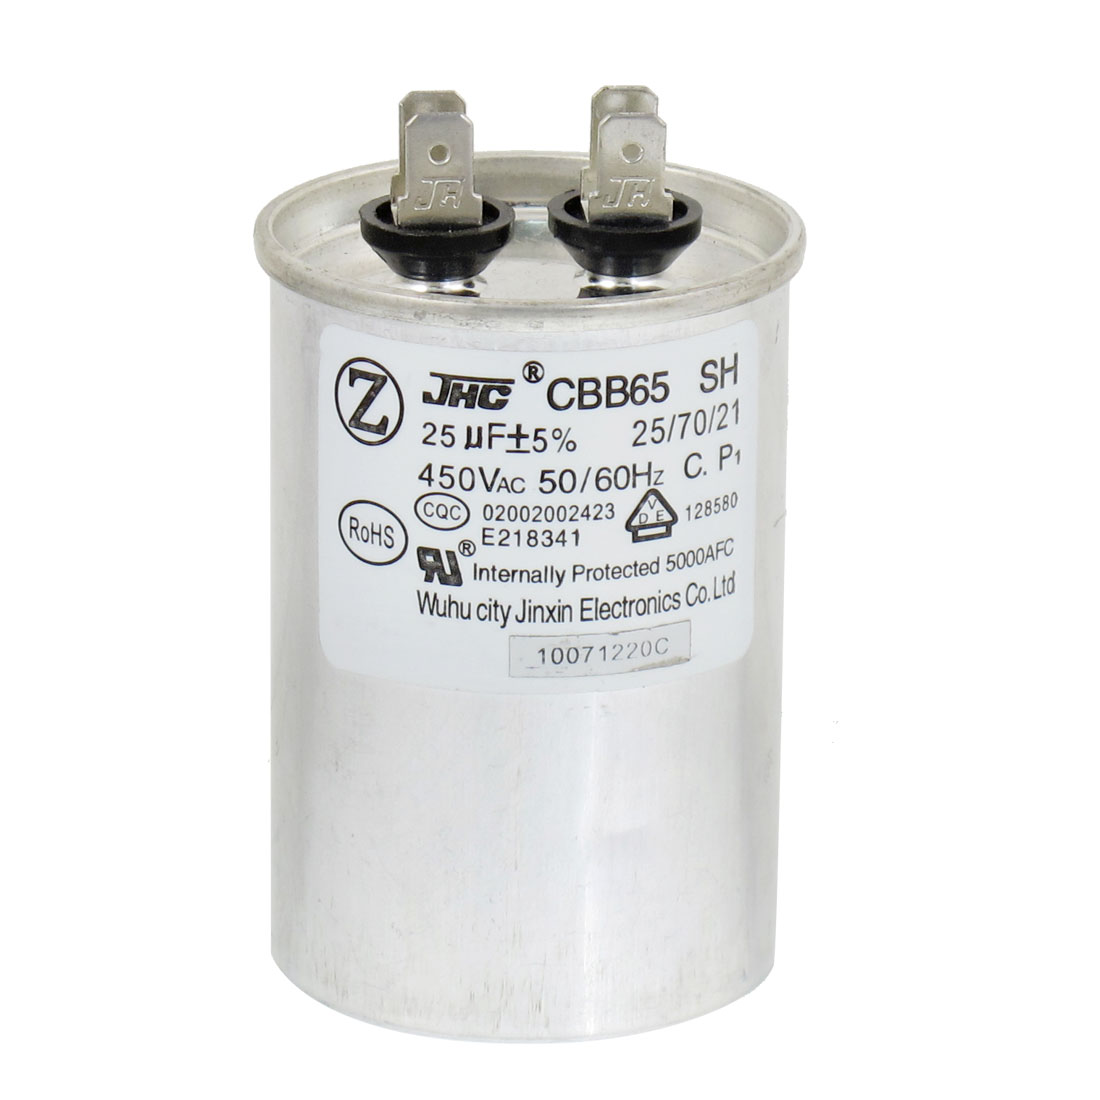 CBB65 25uF AC 450V Motor Capacitor for Air Conditioner Engine